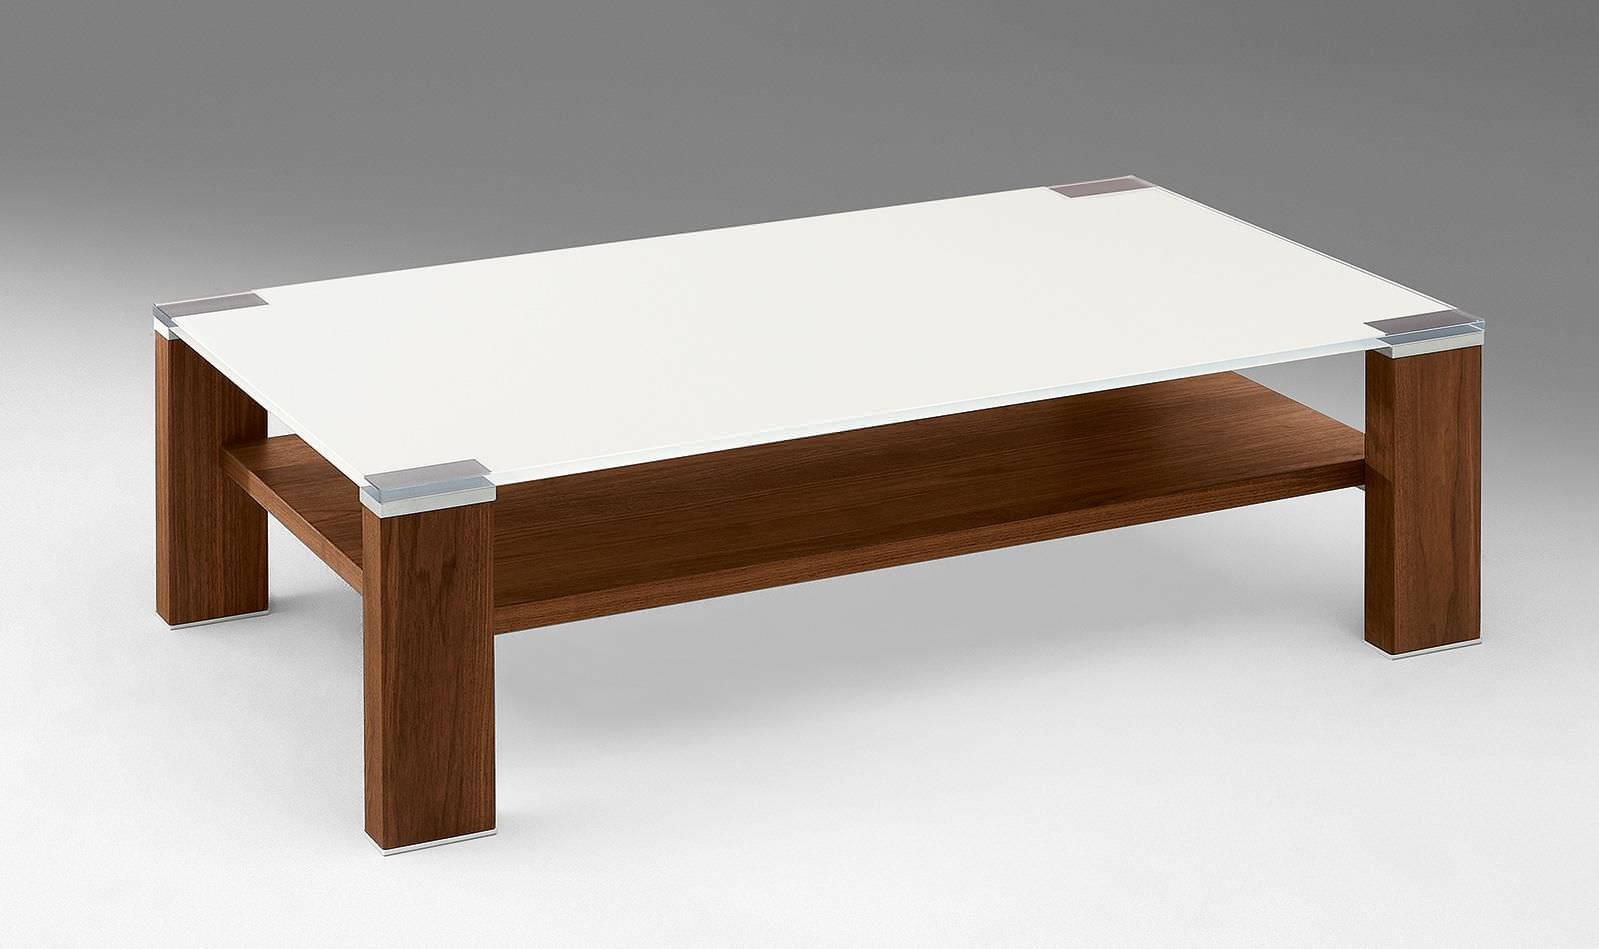 Moderner Couchtisch / Holz / Glas / rechteckig - CT484 - Alfons ...